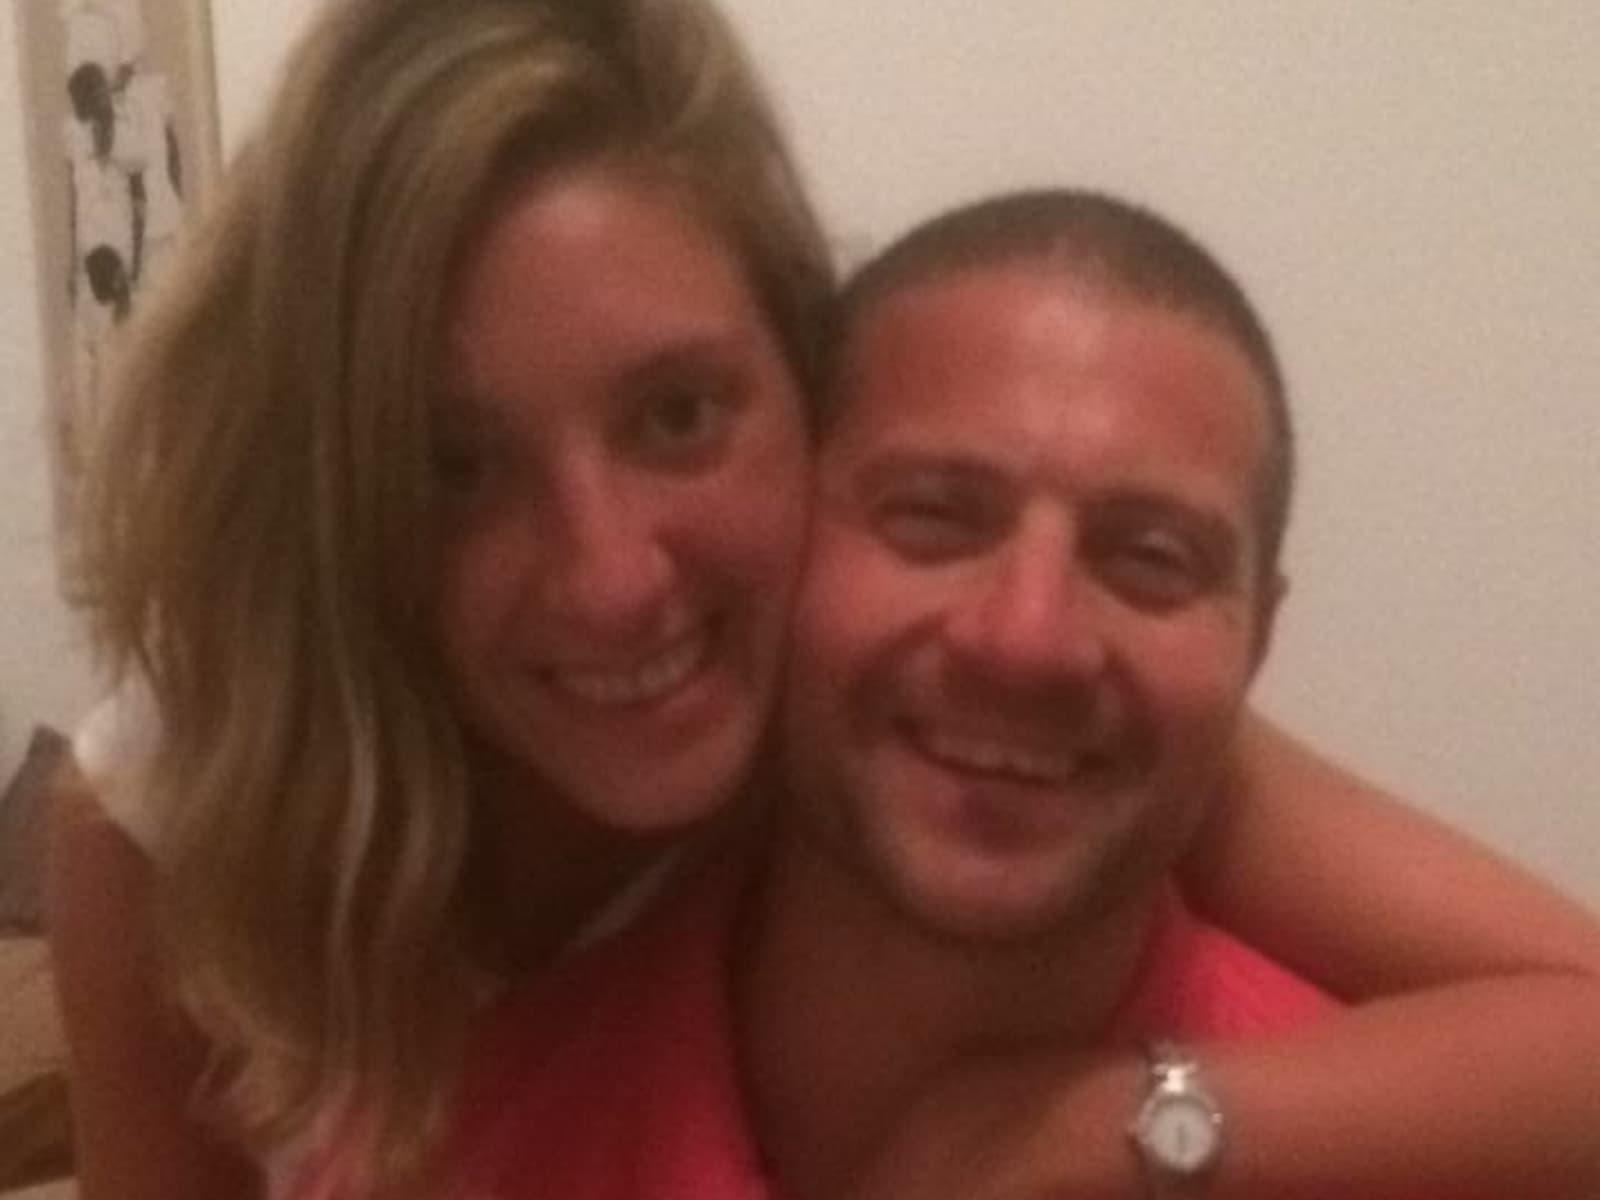 Sofia & Ignacio from Barcelona, Spain